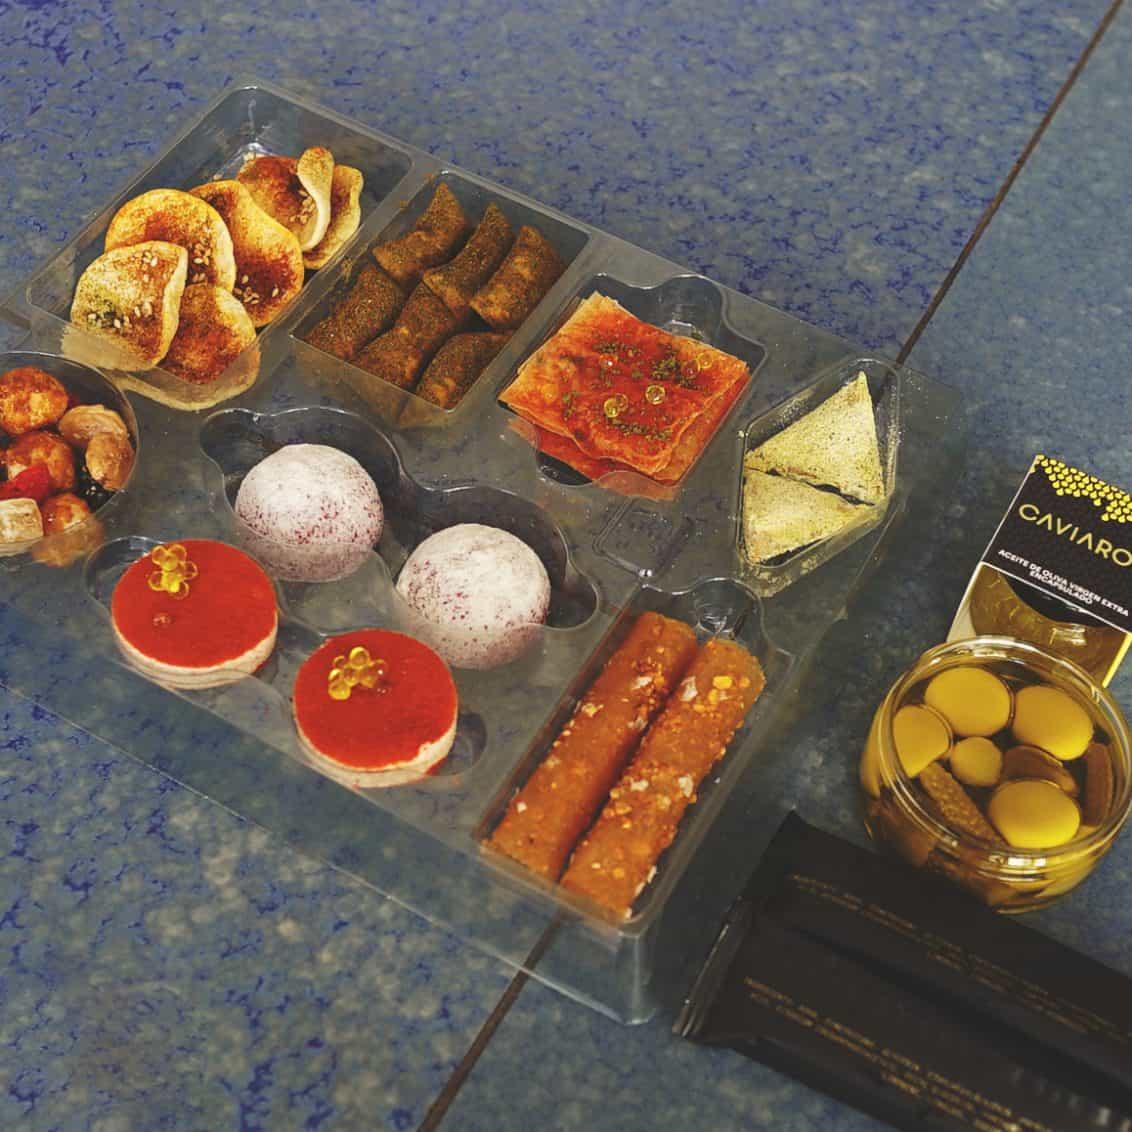 CD-at-Home-snacks-2-1132x1132